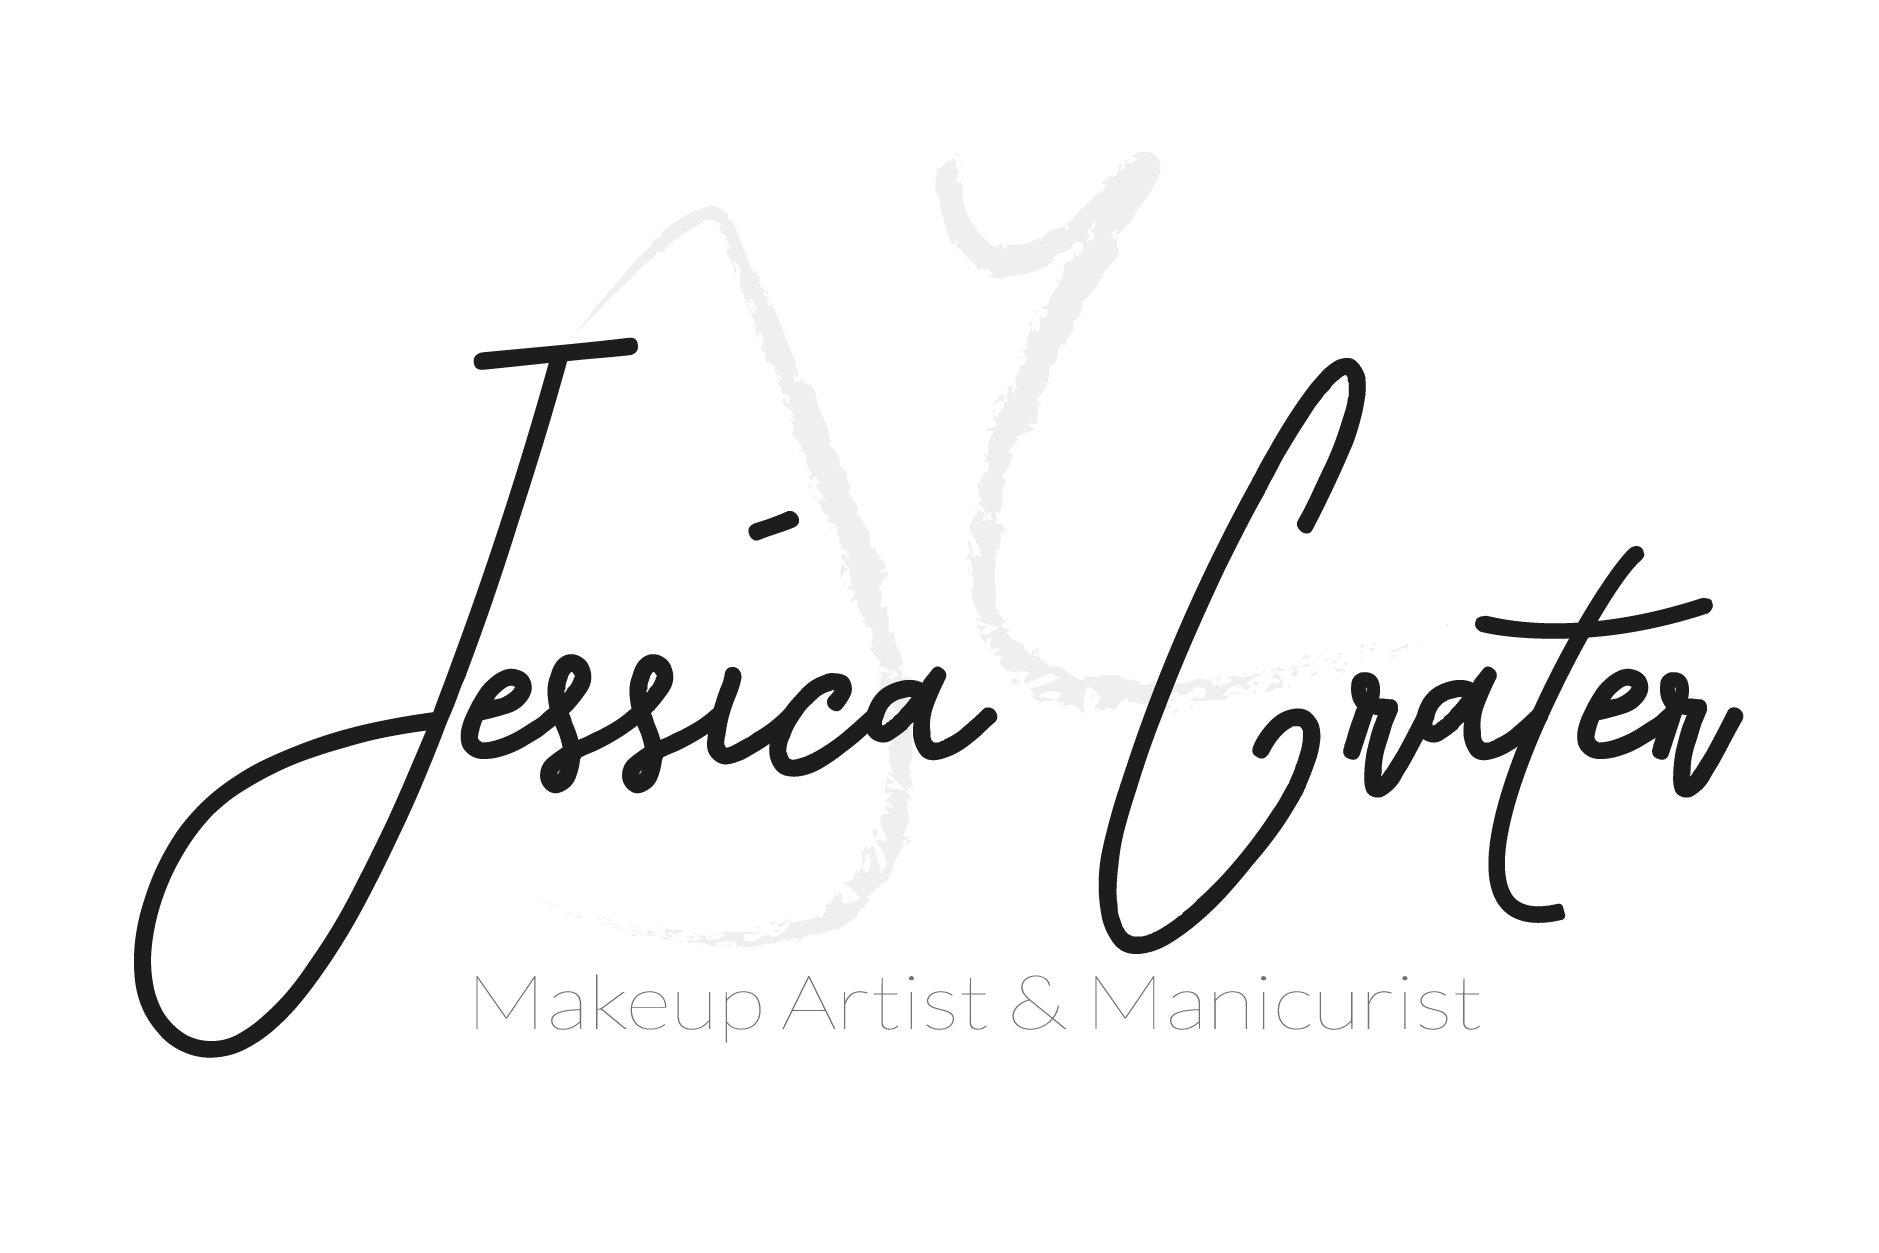 Jessica Crater - Makeup Artist & Manicurist